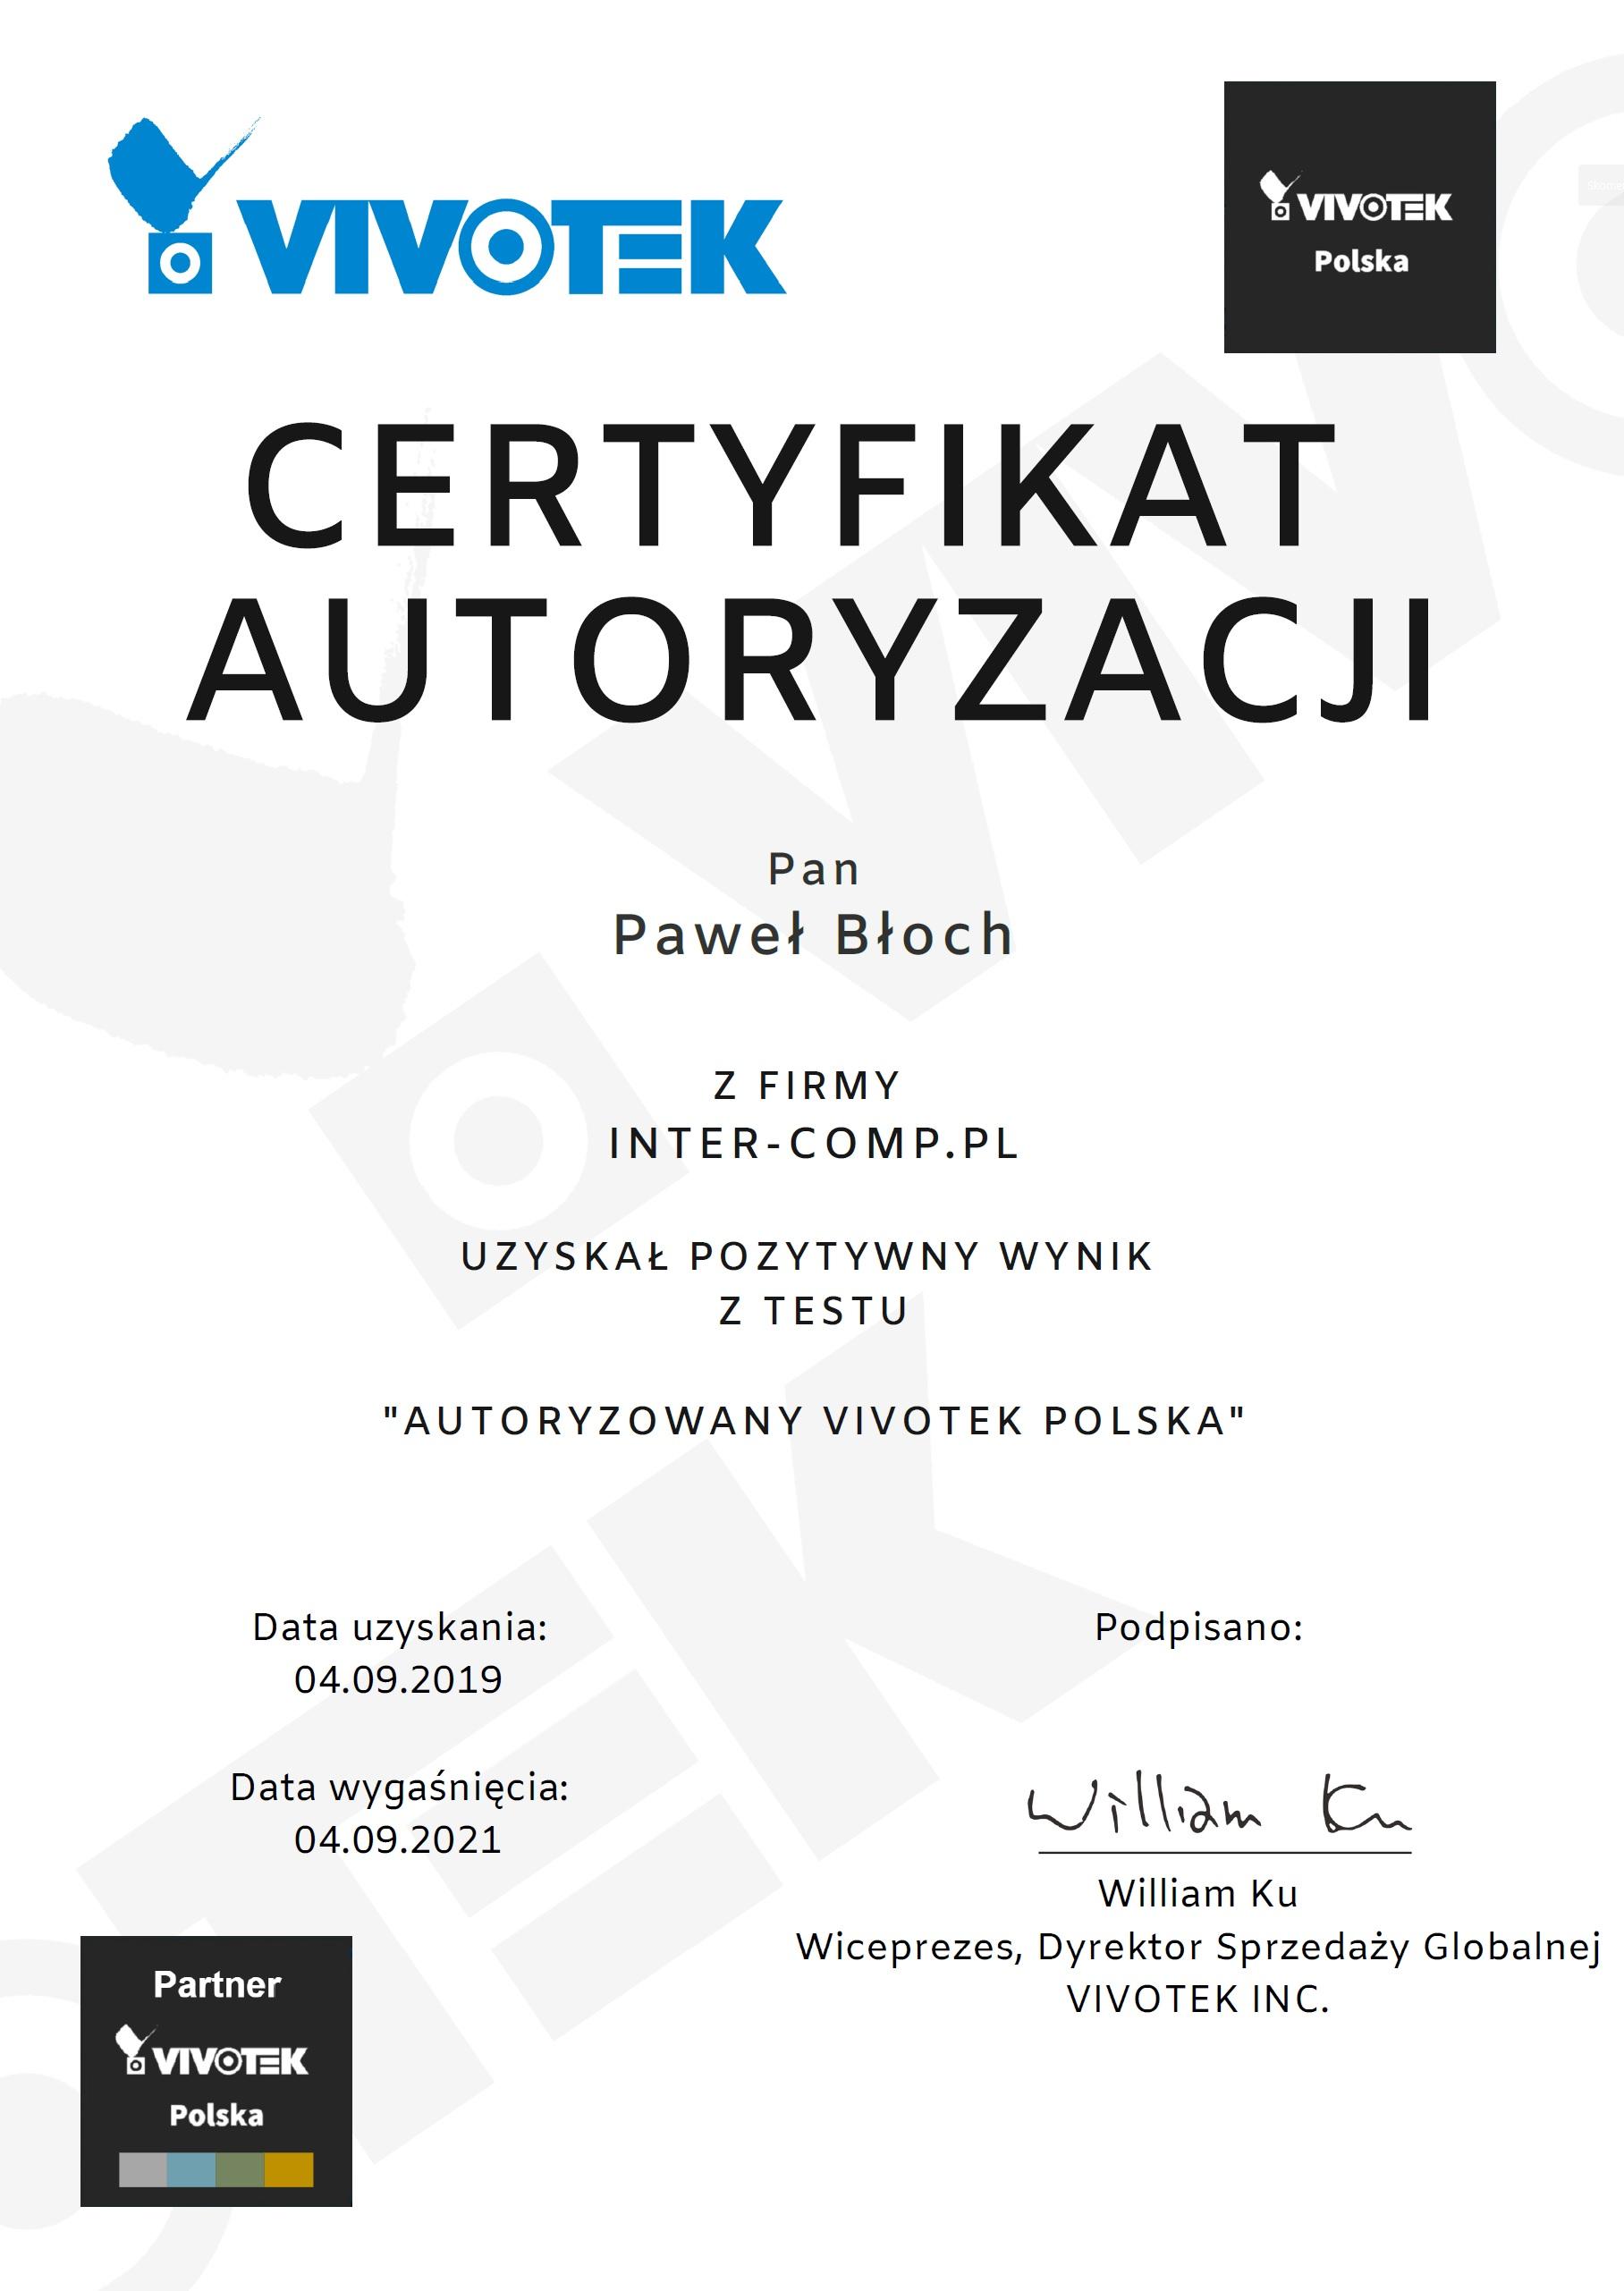 Vivotek certyfikat